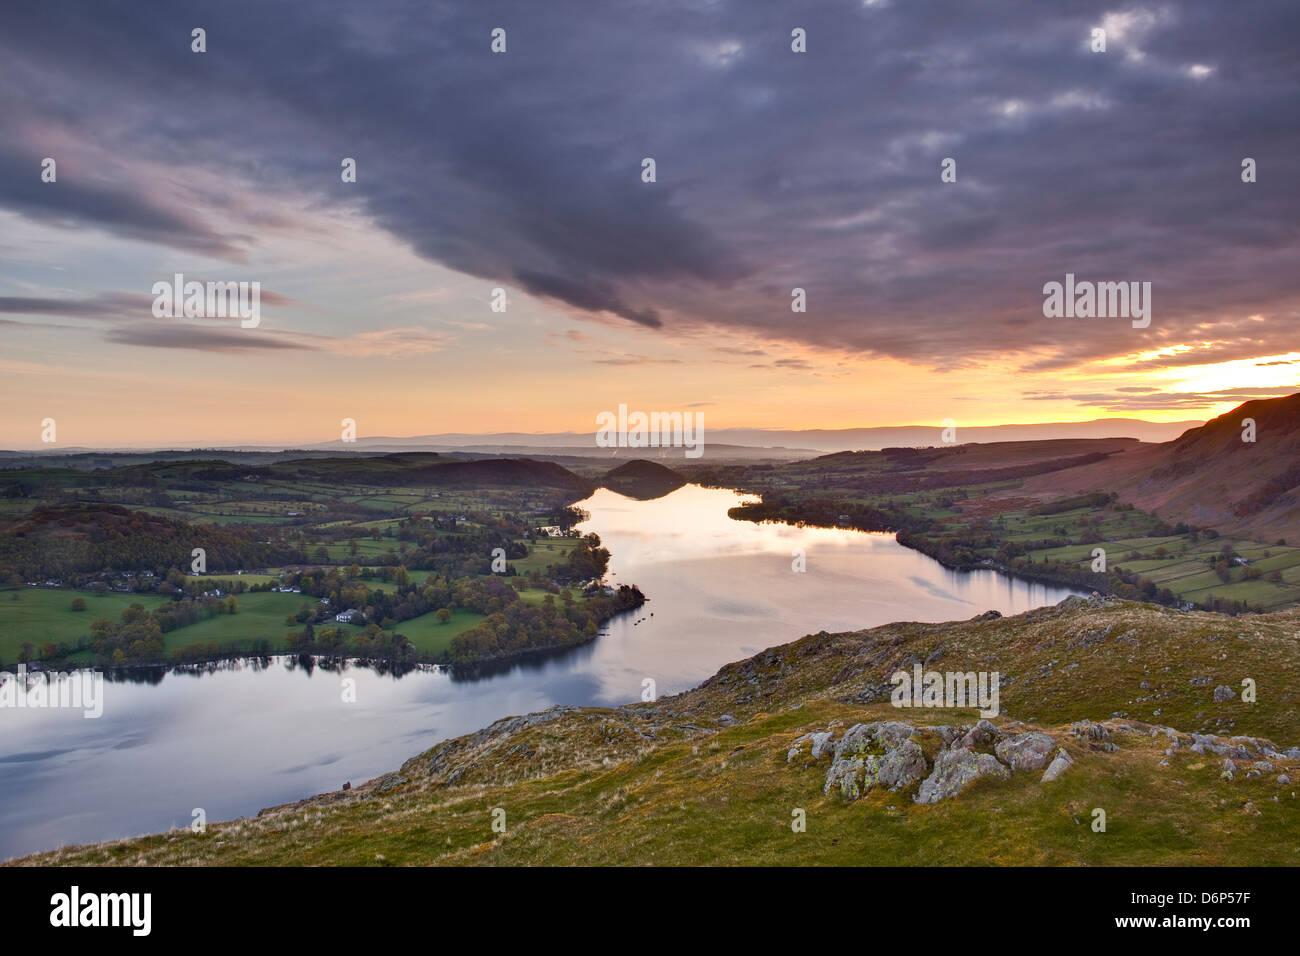 Ullswater en el Lake District National Park, Cumbria, Inglaterra, Reino Unido, Europa Imagen De Stock